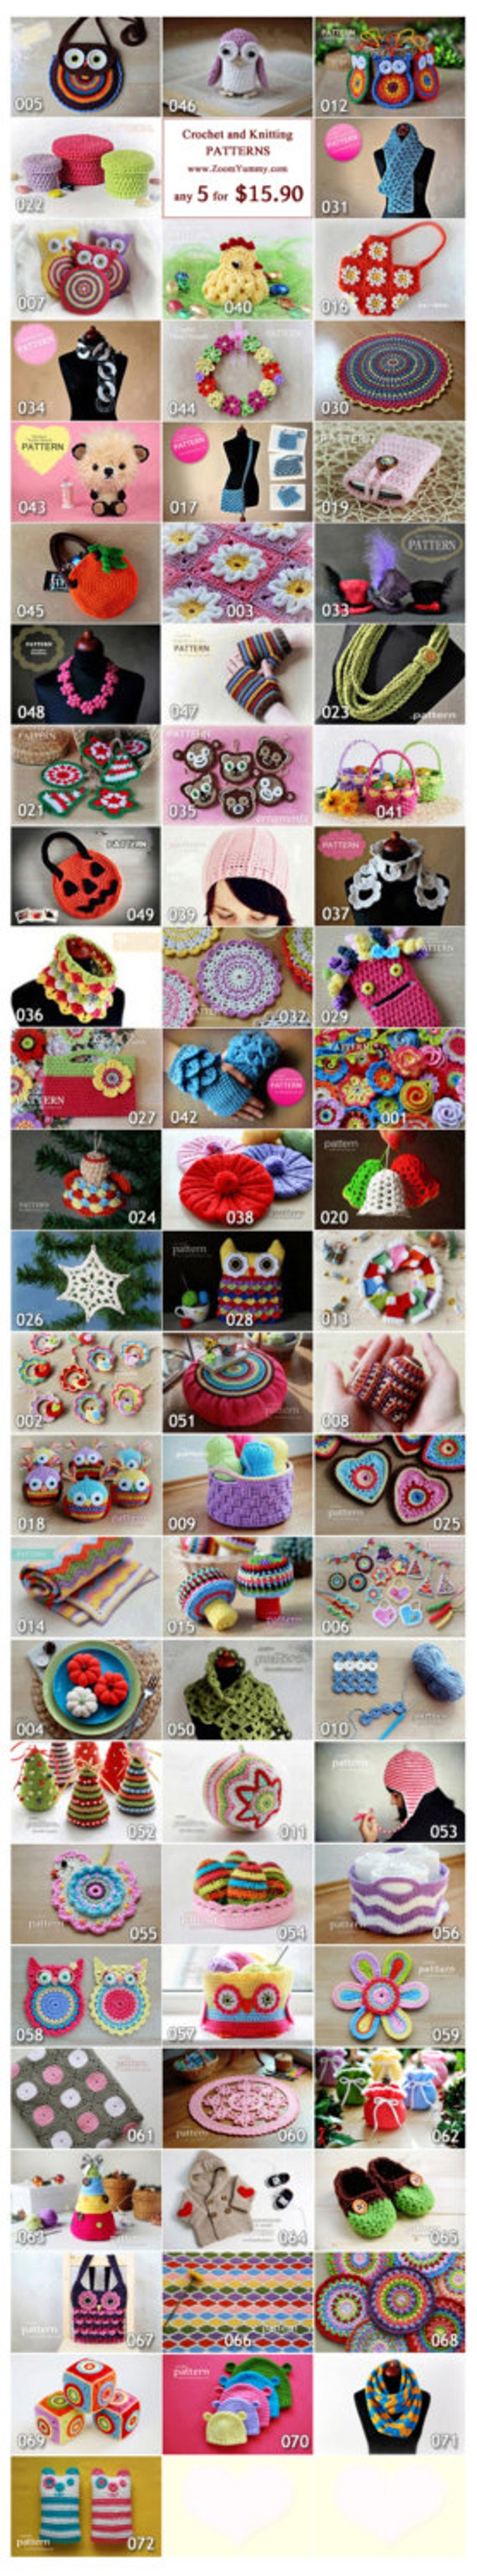 Crochet Patterns - Pick Any 5 Crochet and Knitting Patterns Bundle